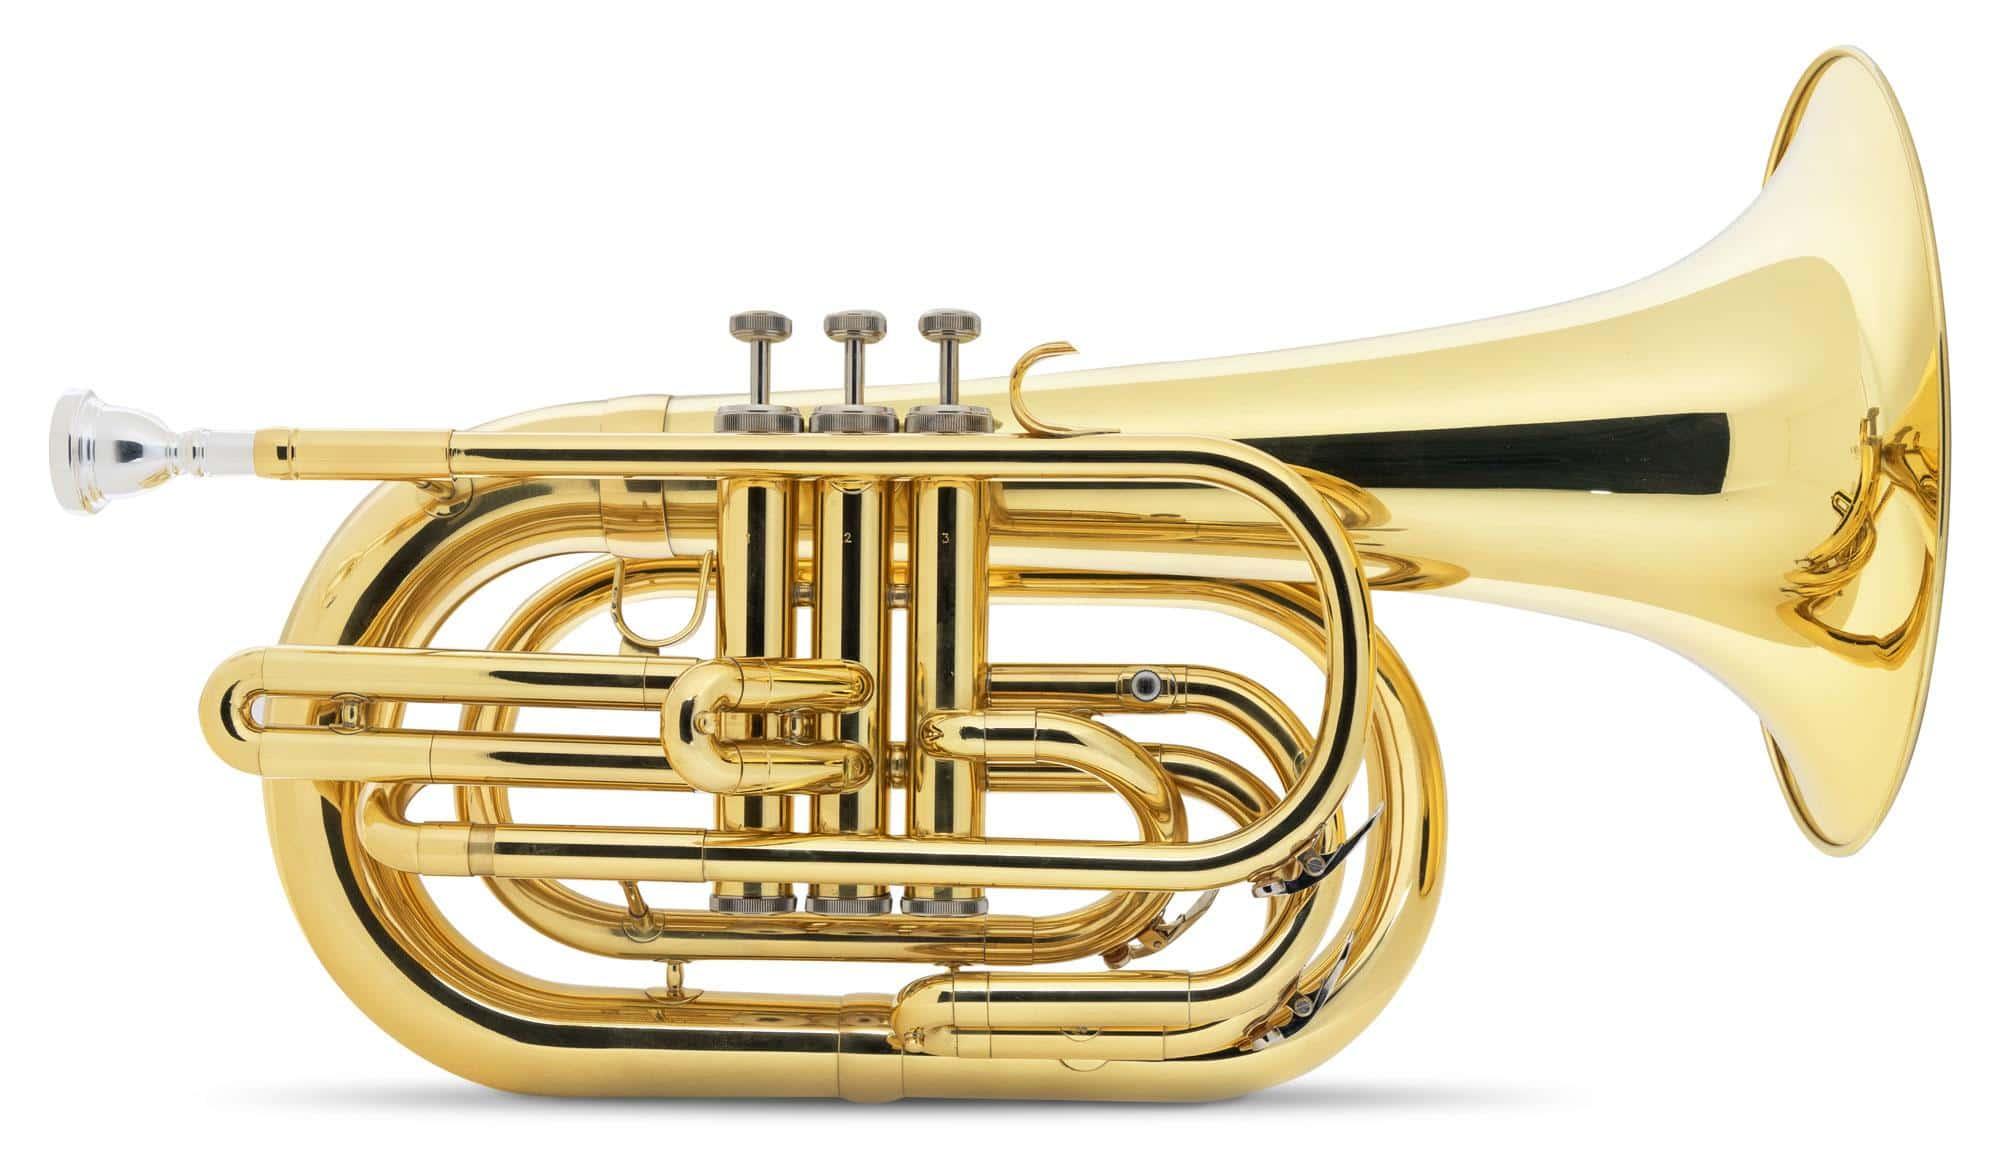 Baritone - Classic Cantabile MB 33 Marching Bariton - Onlineshop Musikhaus Kirstein